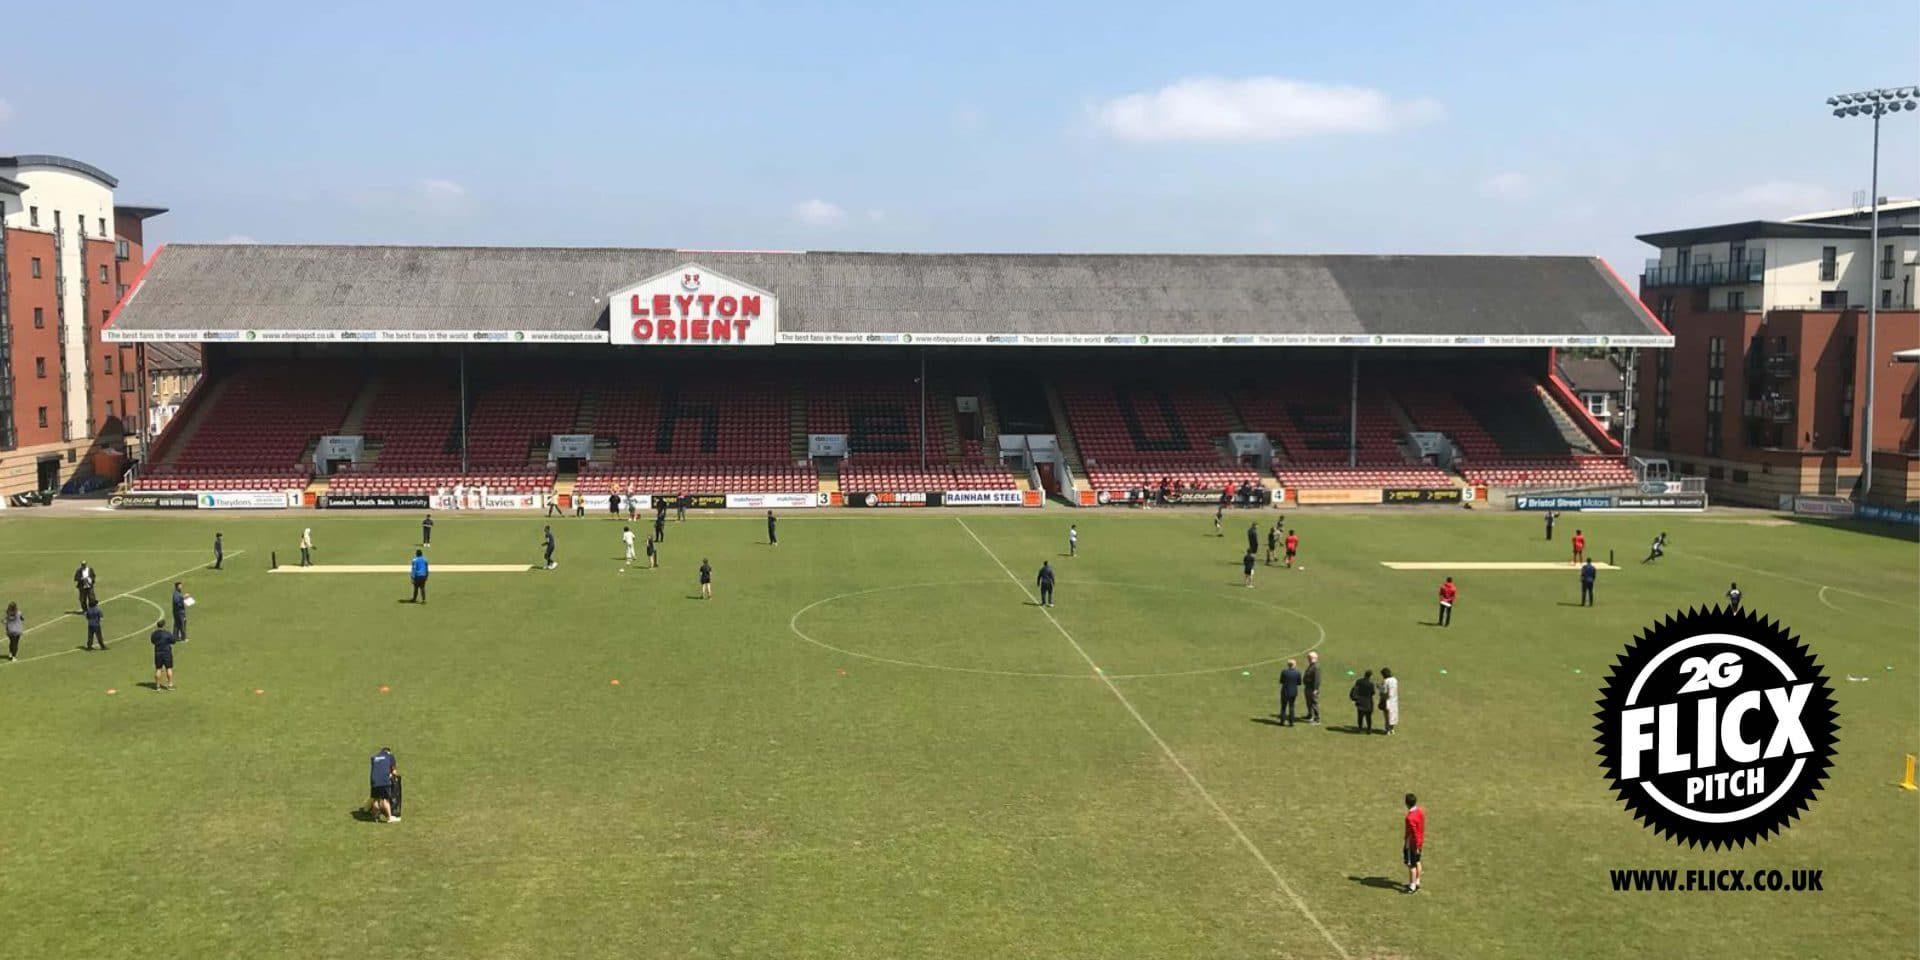 Cricket at a football ground